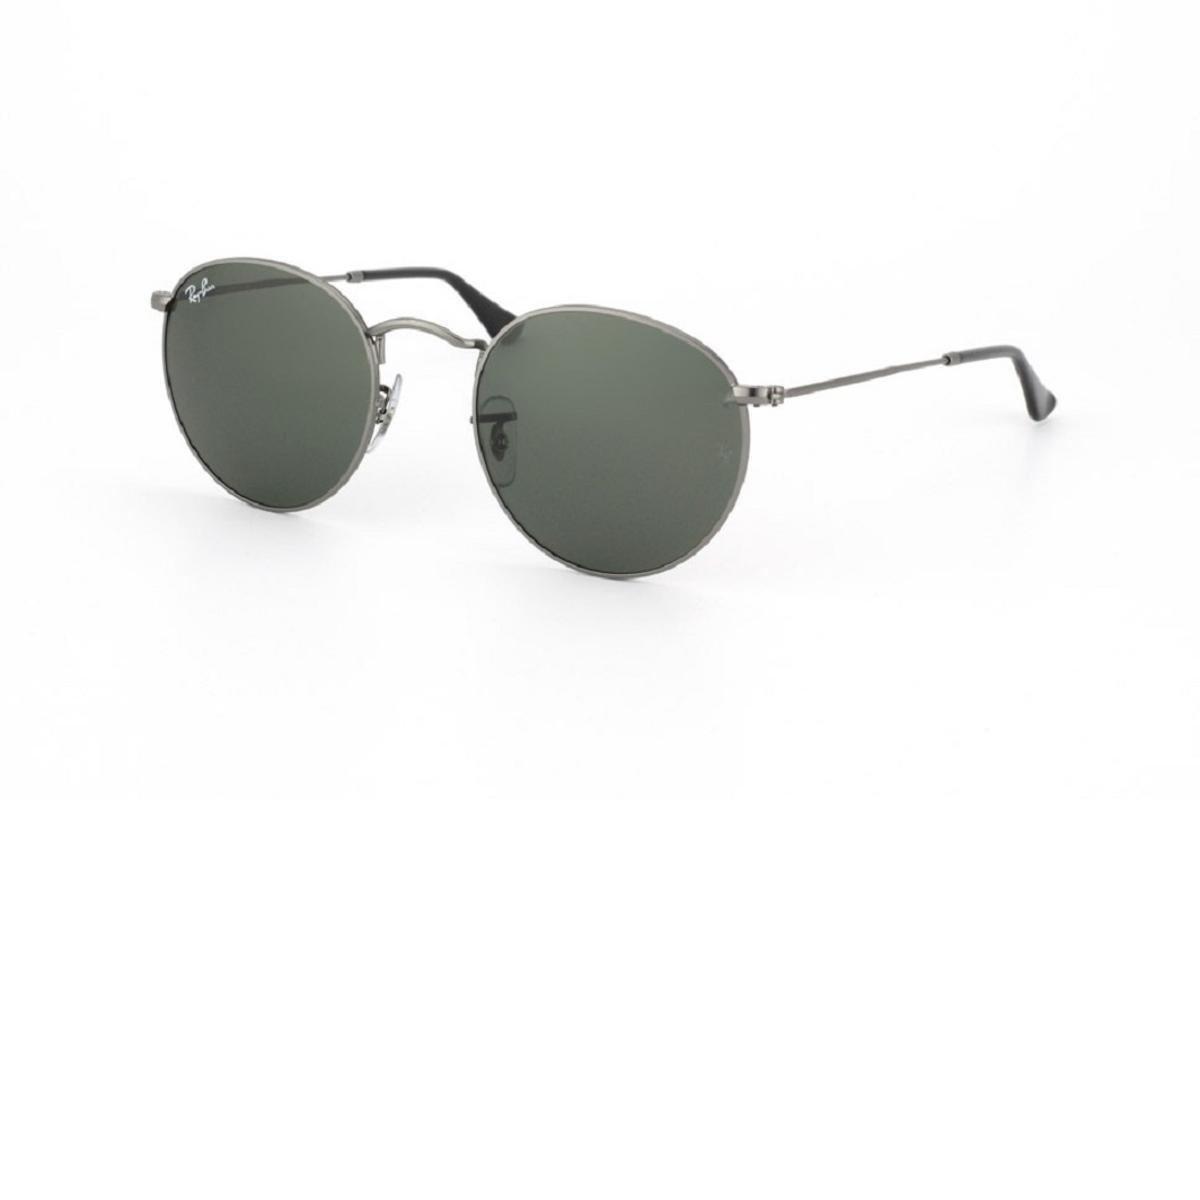 Ray Ban Round Metal RB3447L 029 Óculos de Sol - Prata - Compre Agora ... 30b1605856